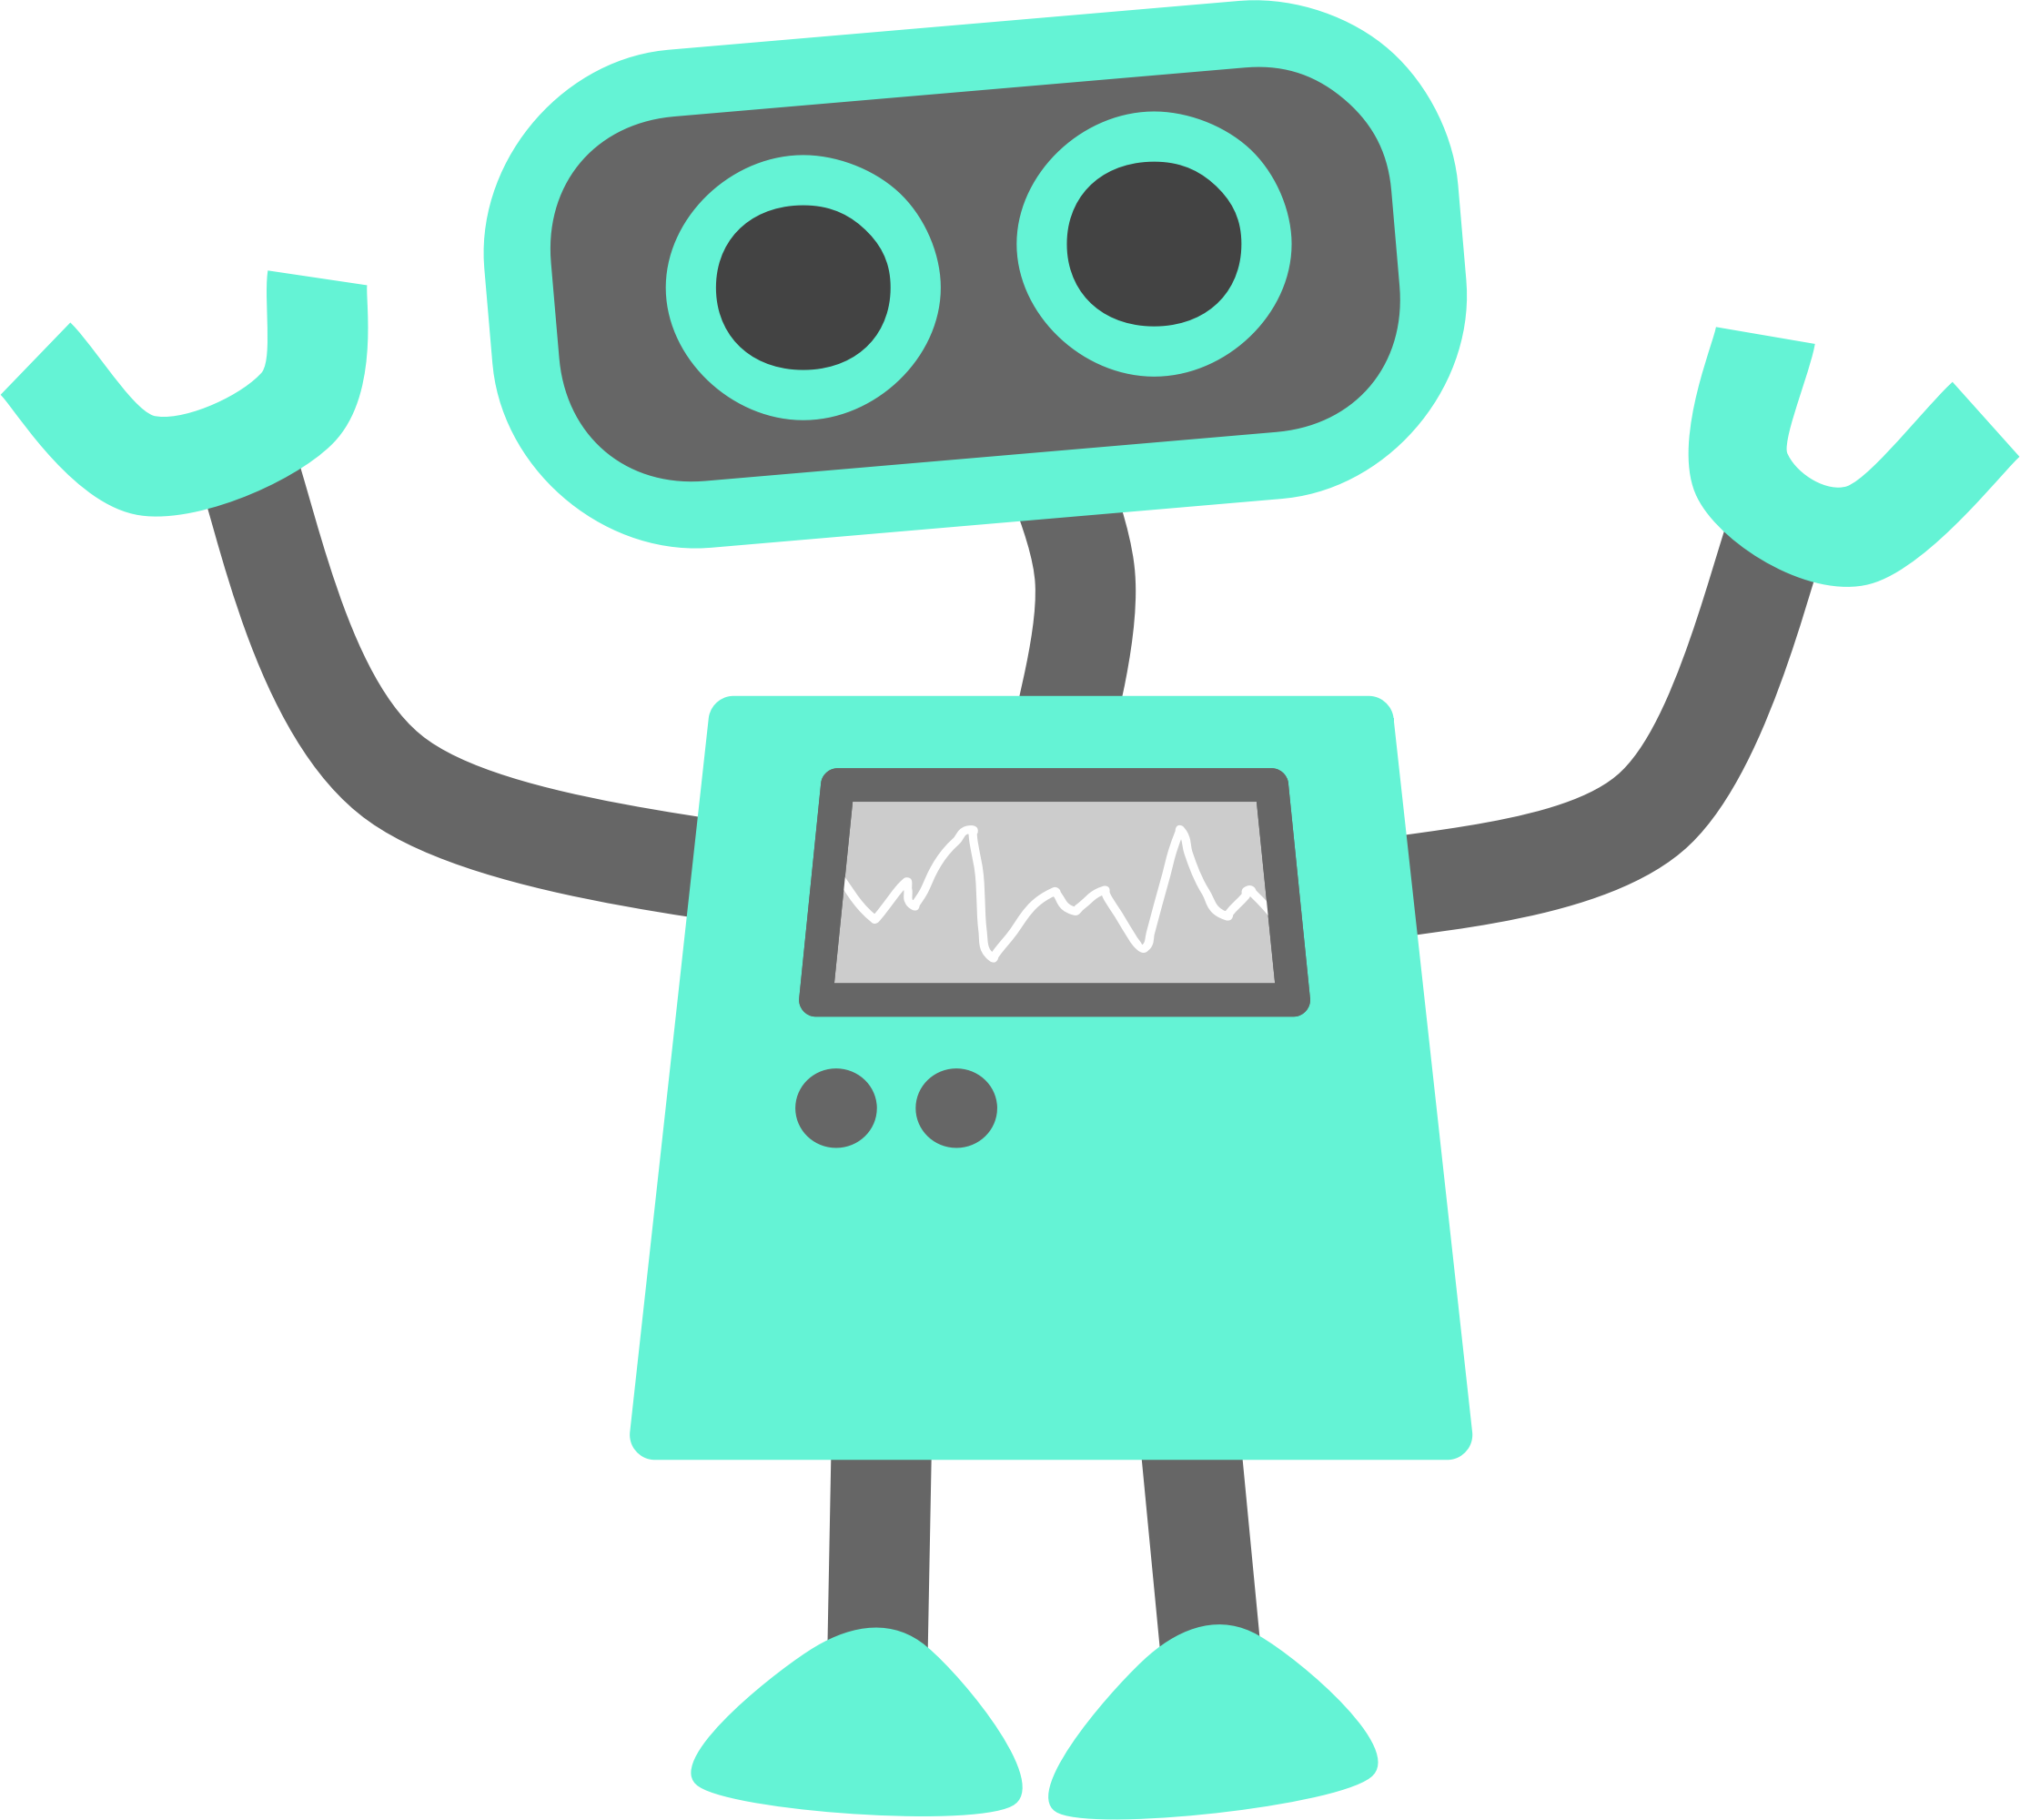 Robot Clipart Png.